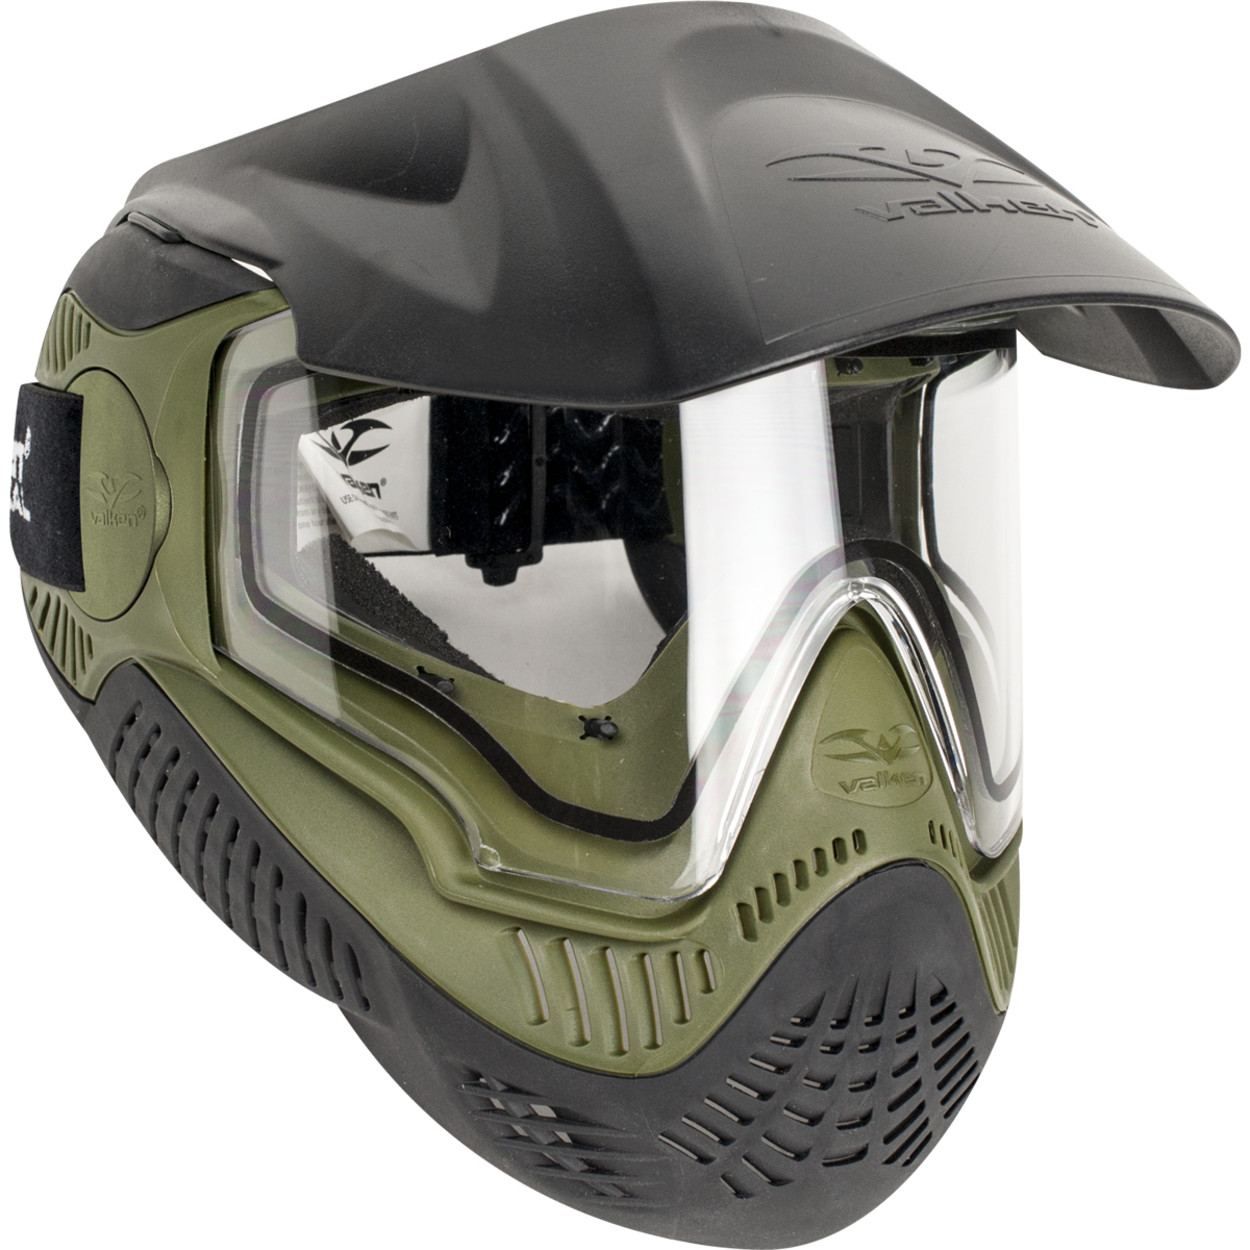 Valken Goggles – MI-9 SC Olive Green product image